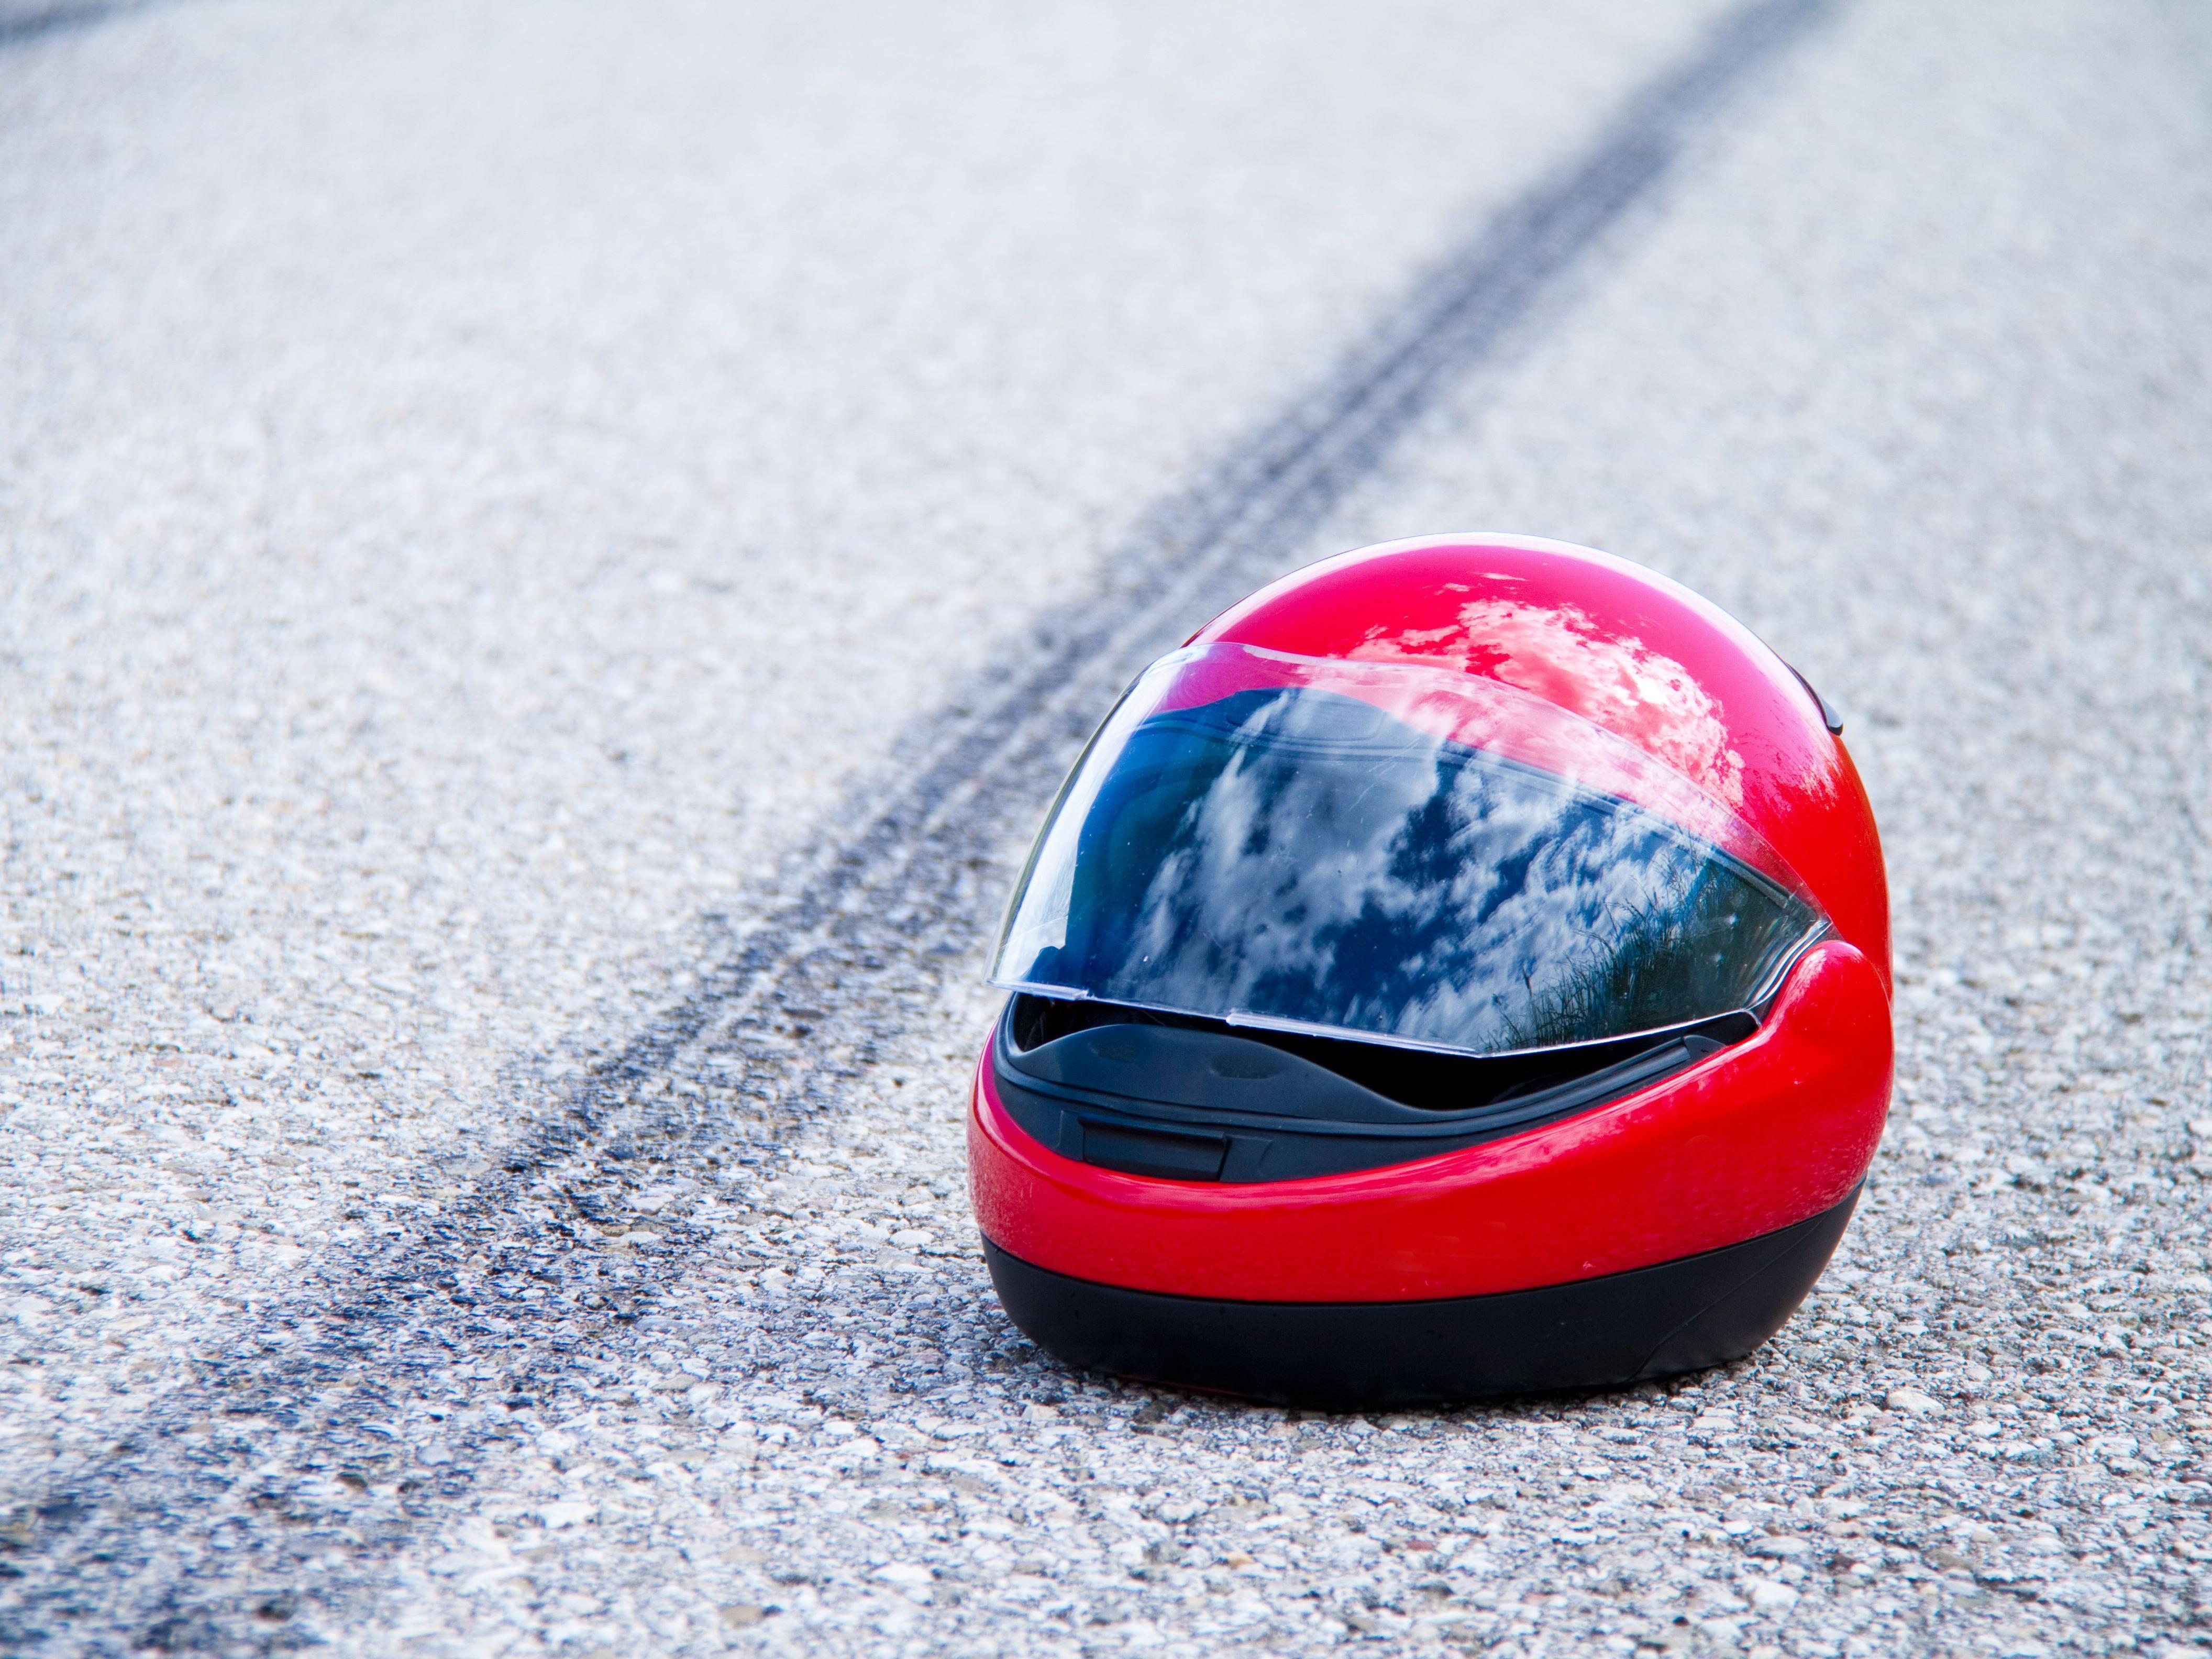 Der Bursch erlag noch an der Unfallstelle seinen schweren Verletzungen.